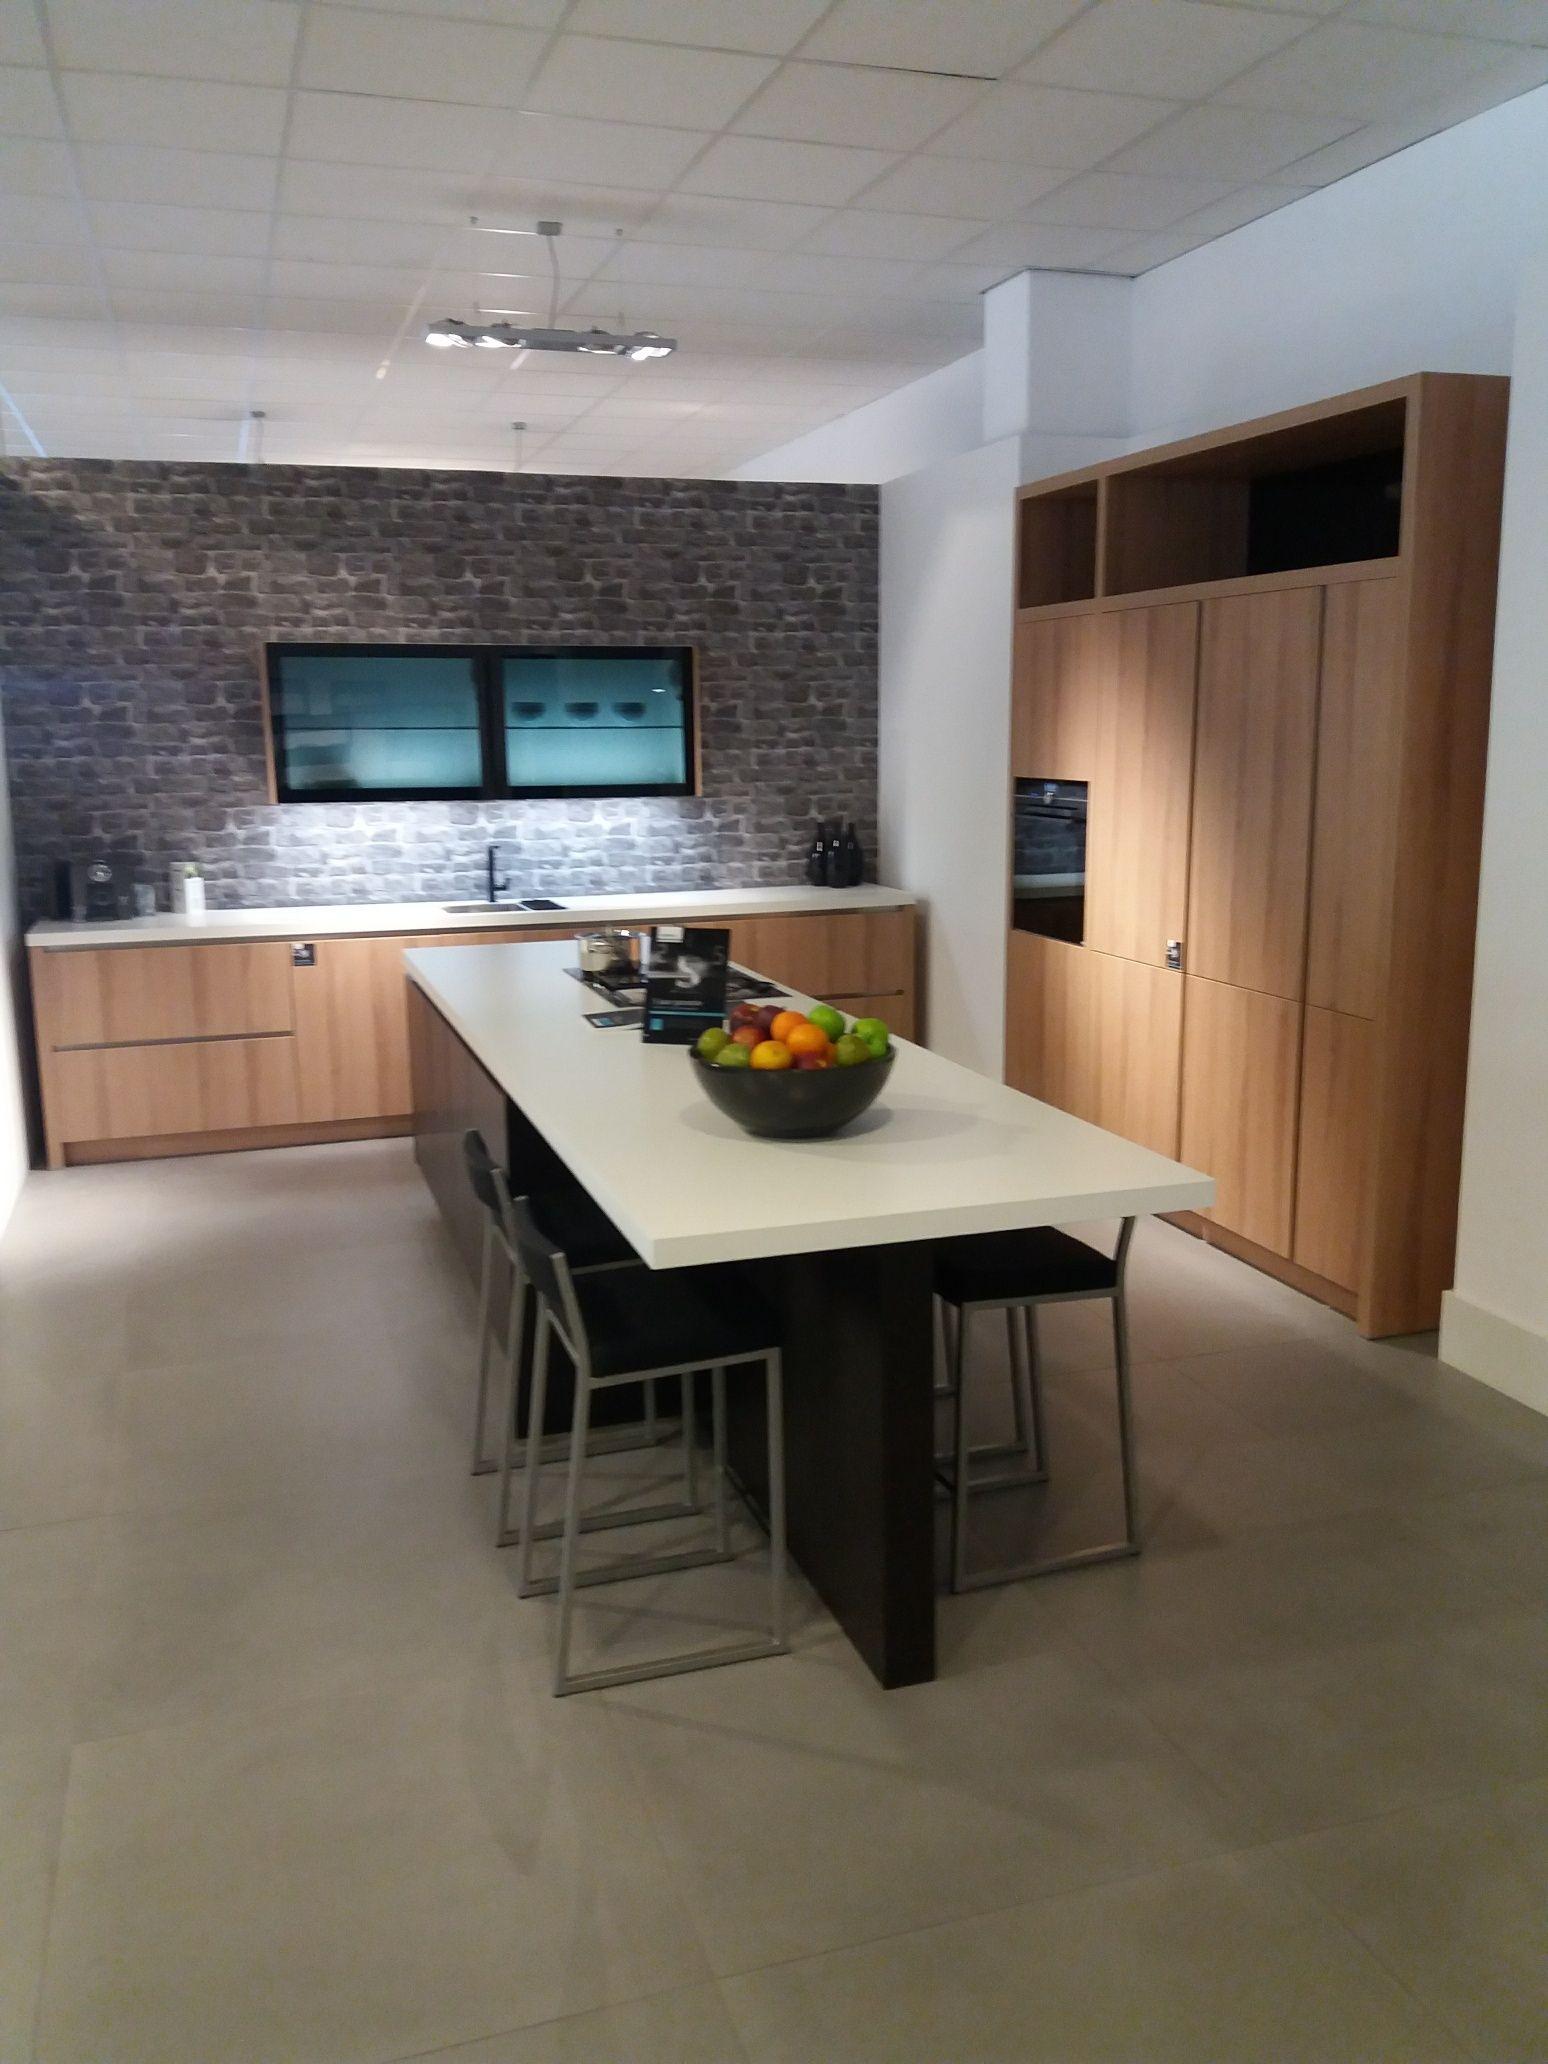 Keukenstekoop Nl Het Grootste Keukenaanbod Van Nederland Houten Eilandkeuken Met Royaal Kookeiland Met Bar 57964